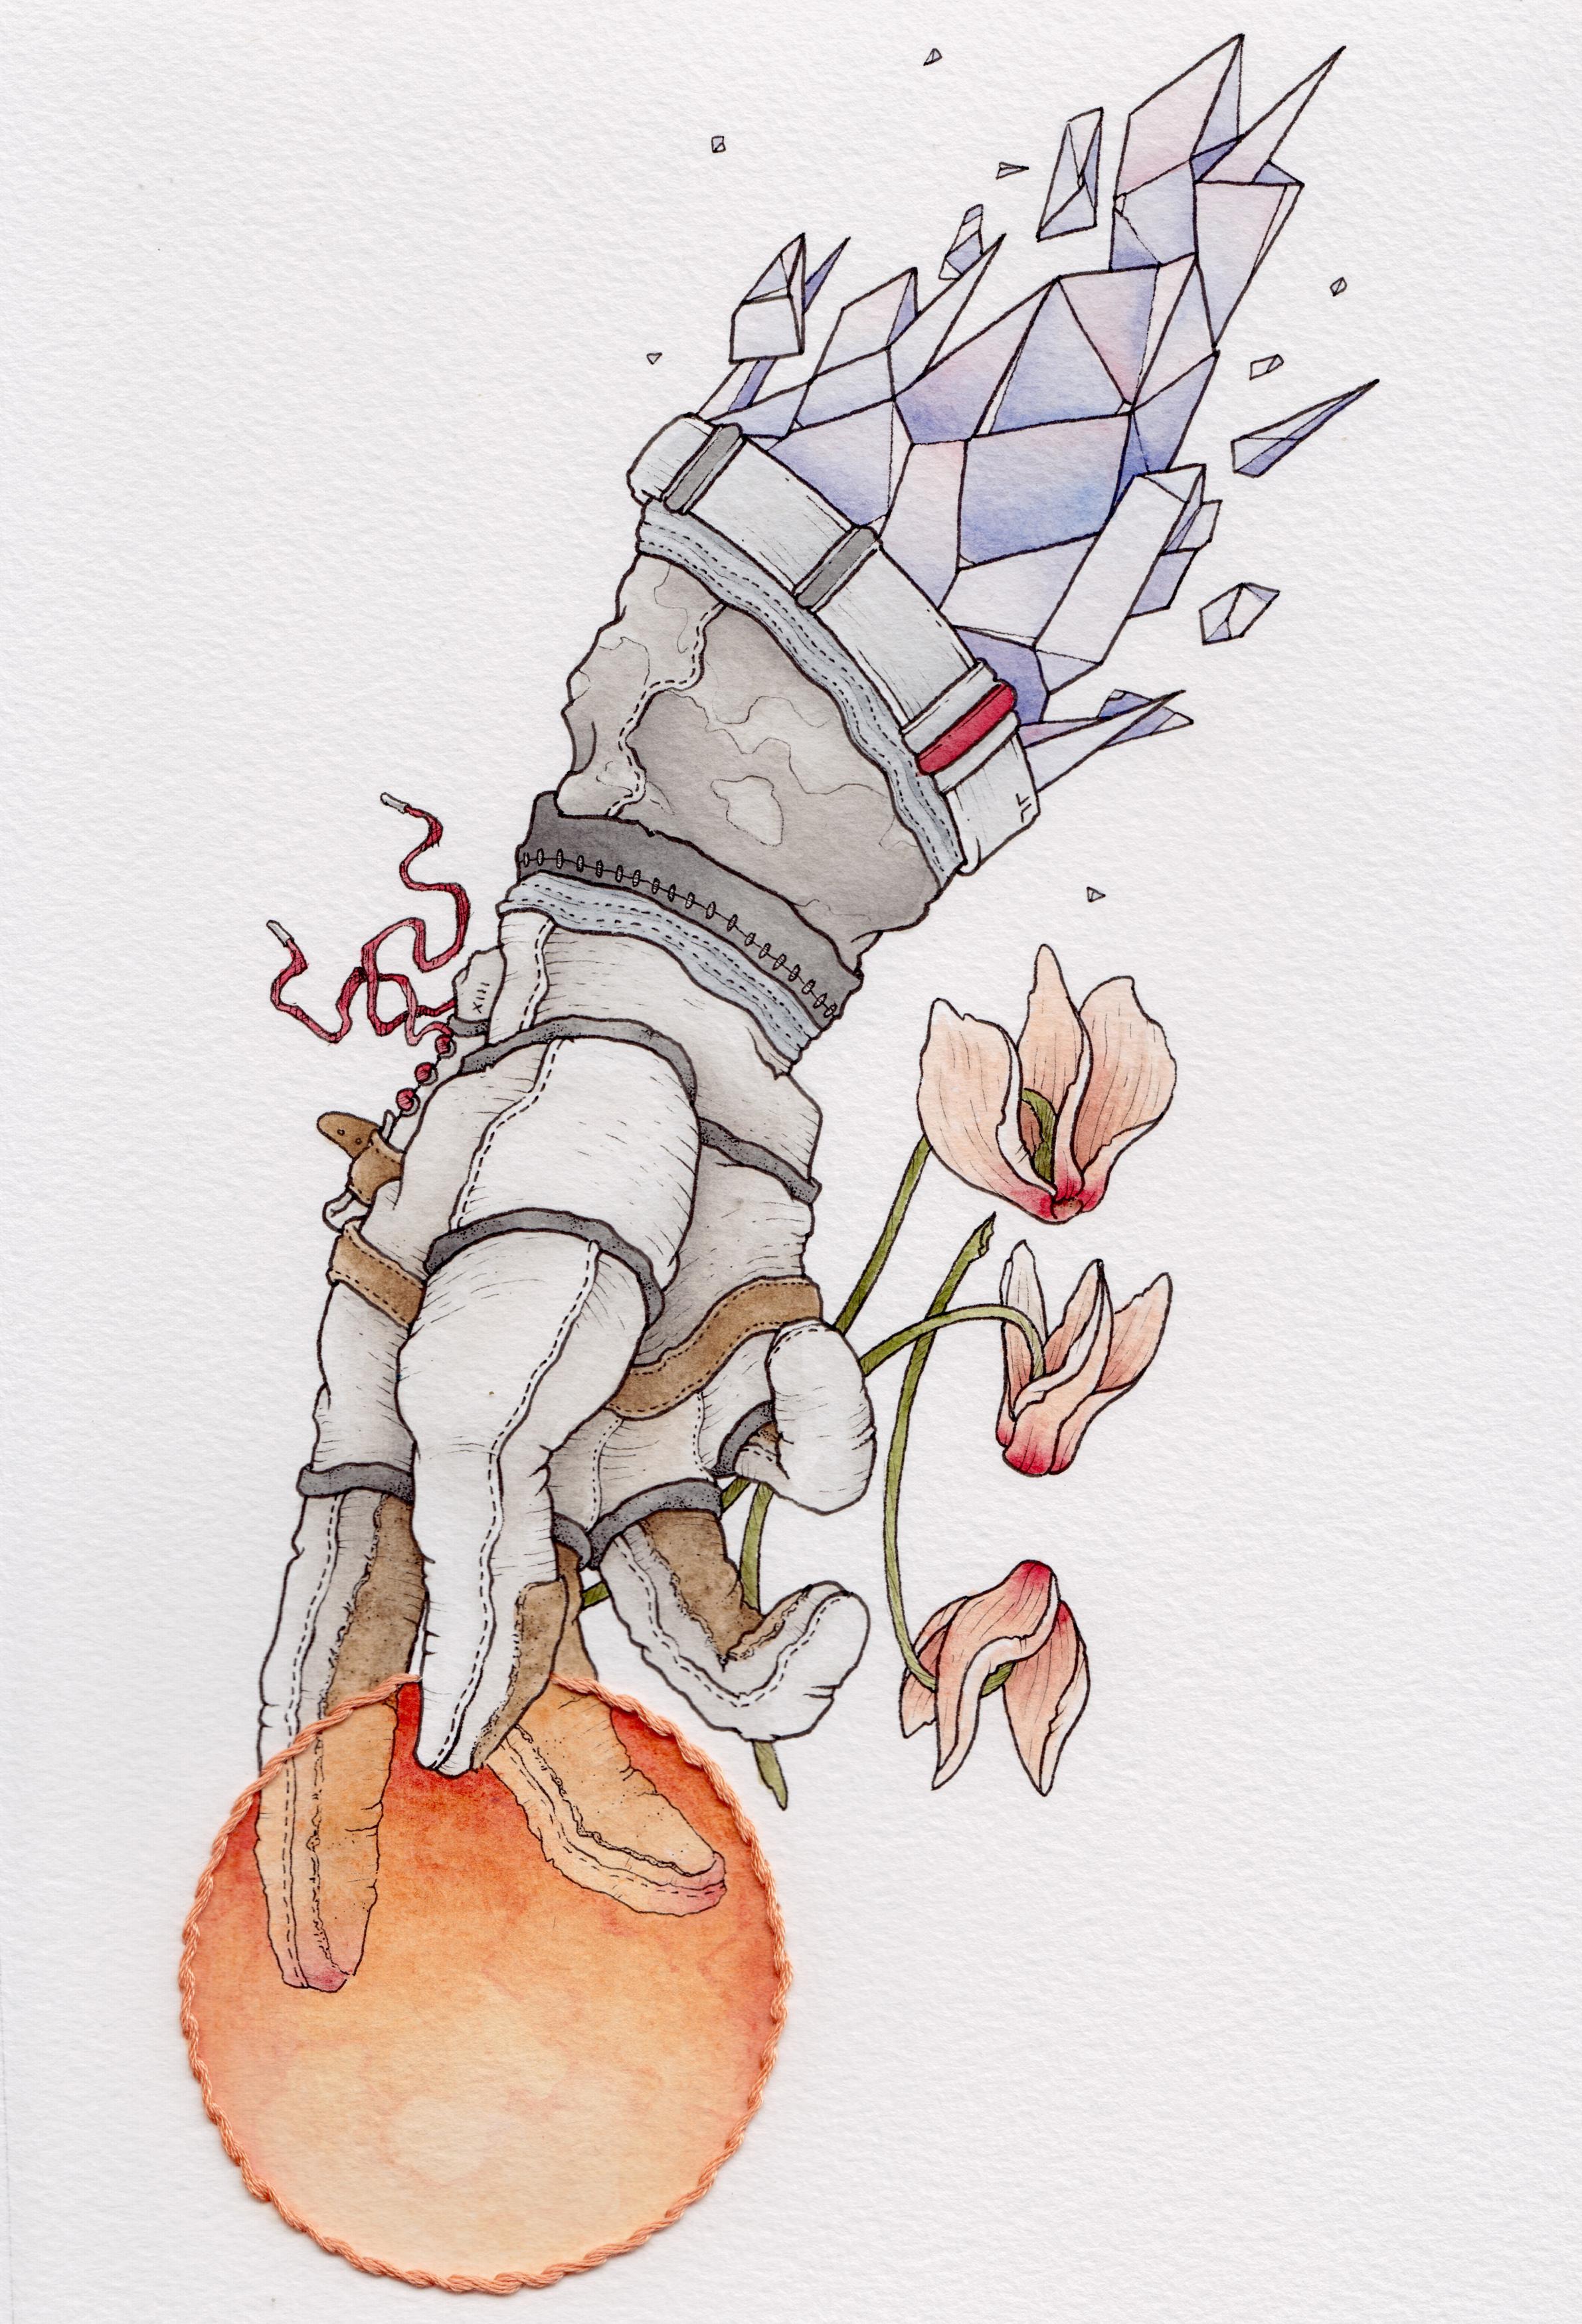 creid-astronaut.jpg